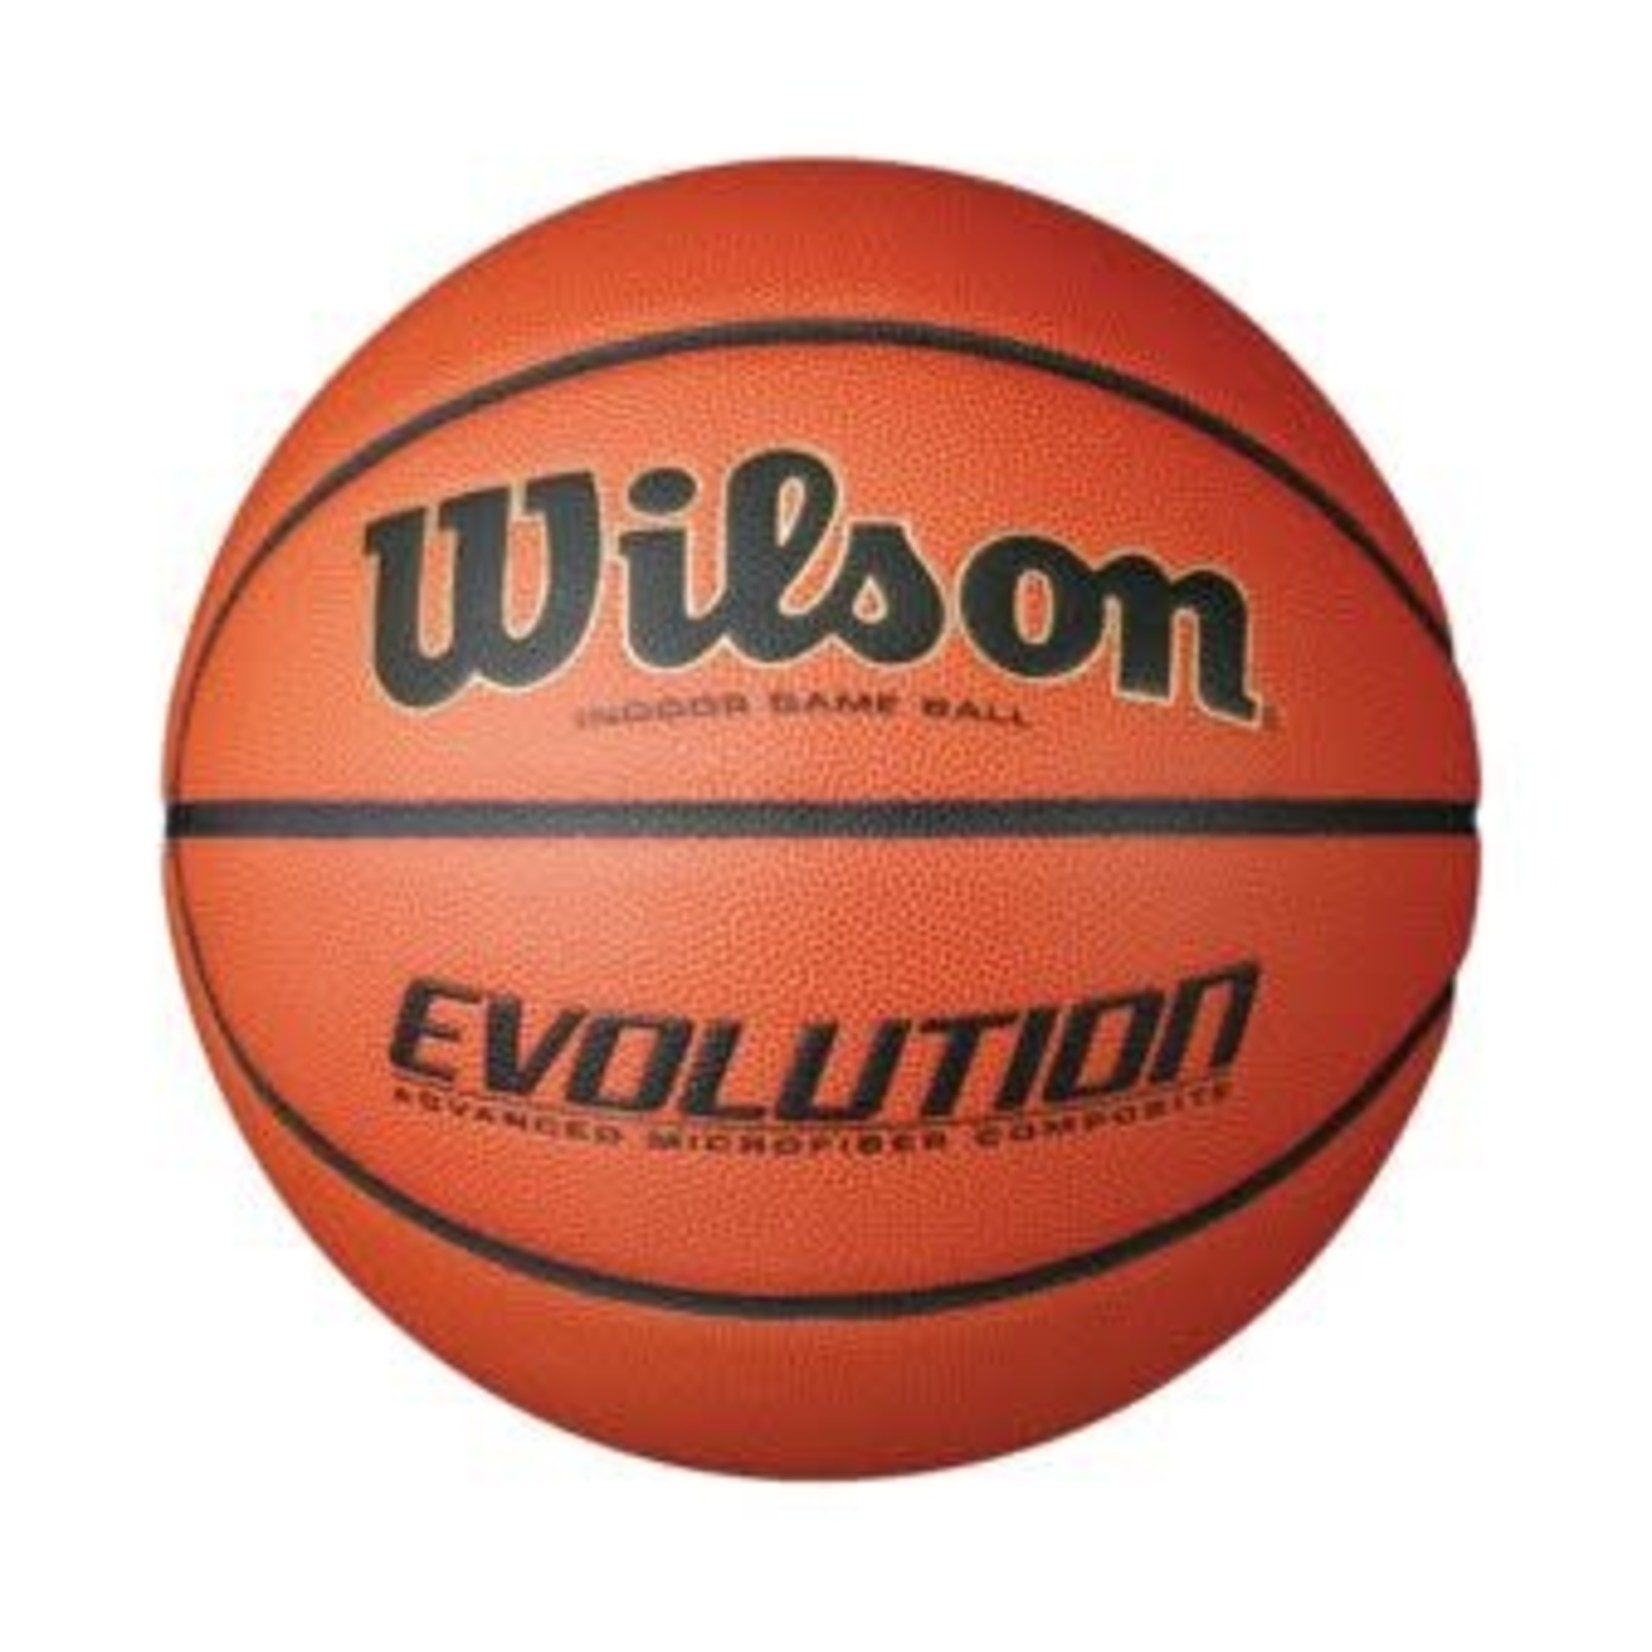 Wilson Wilson Basketball, Evolution Game Ball, Size 7